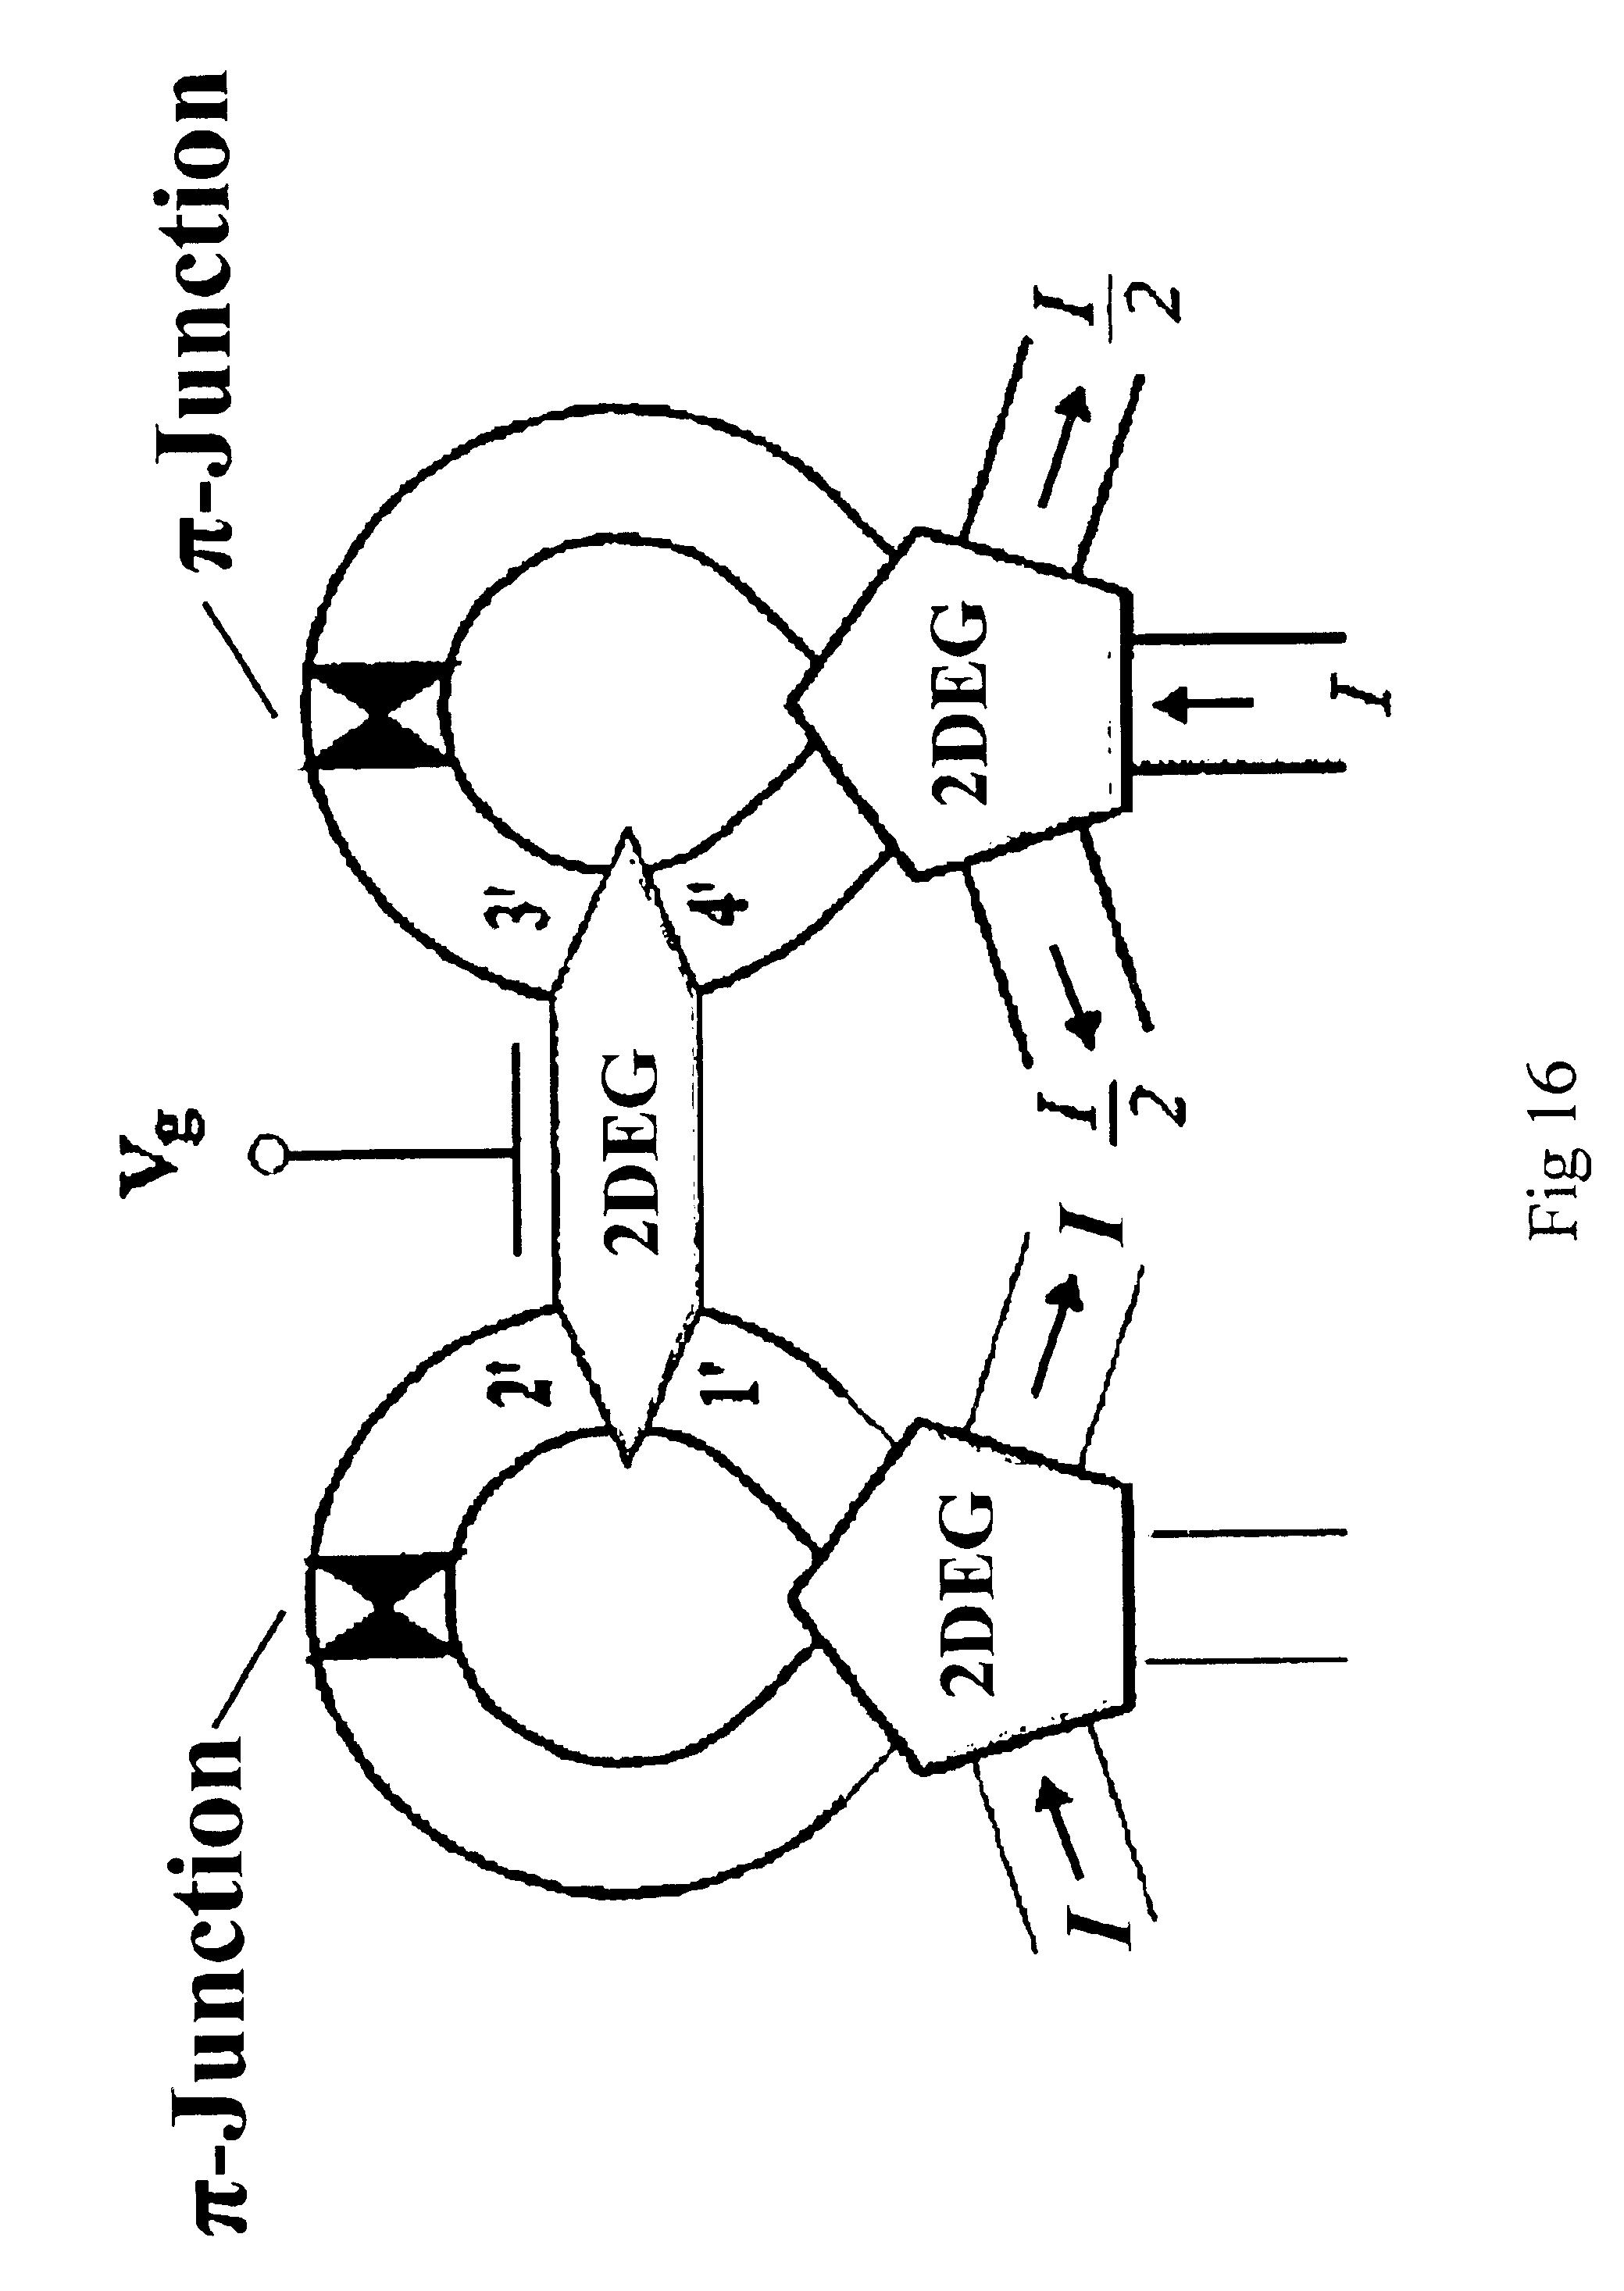 patente us6919579